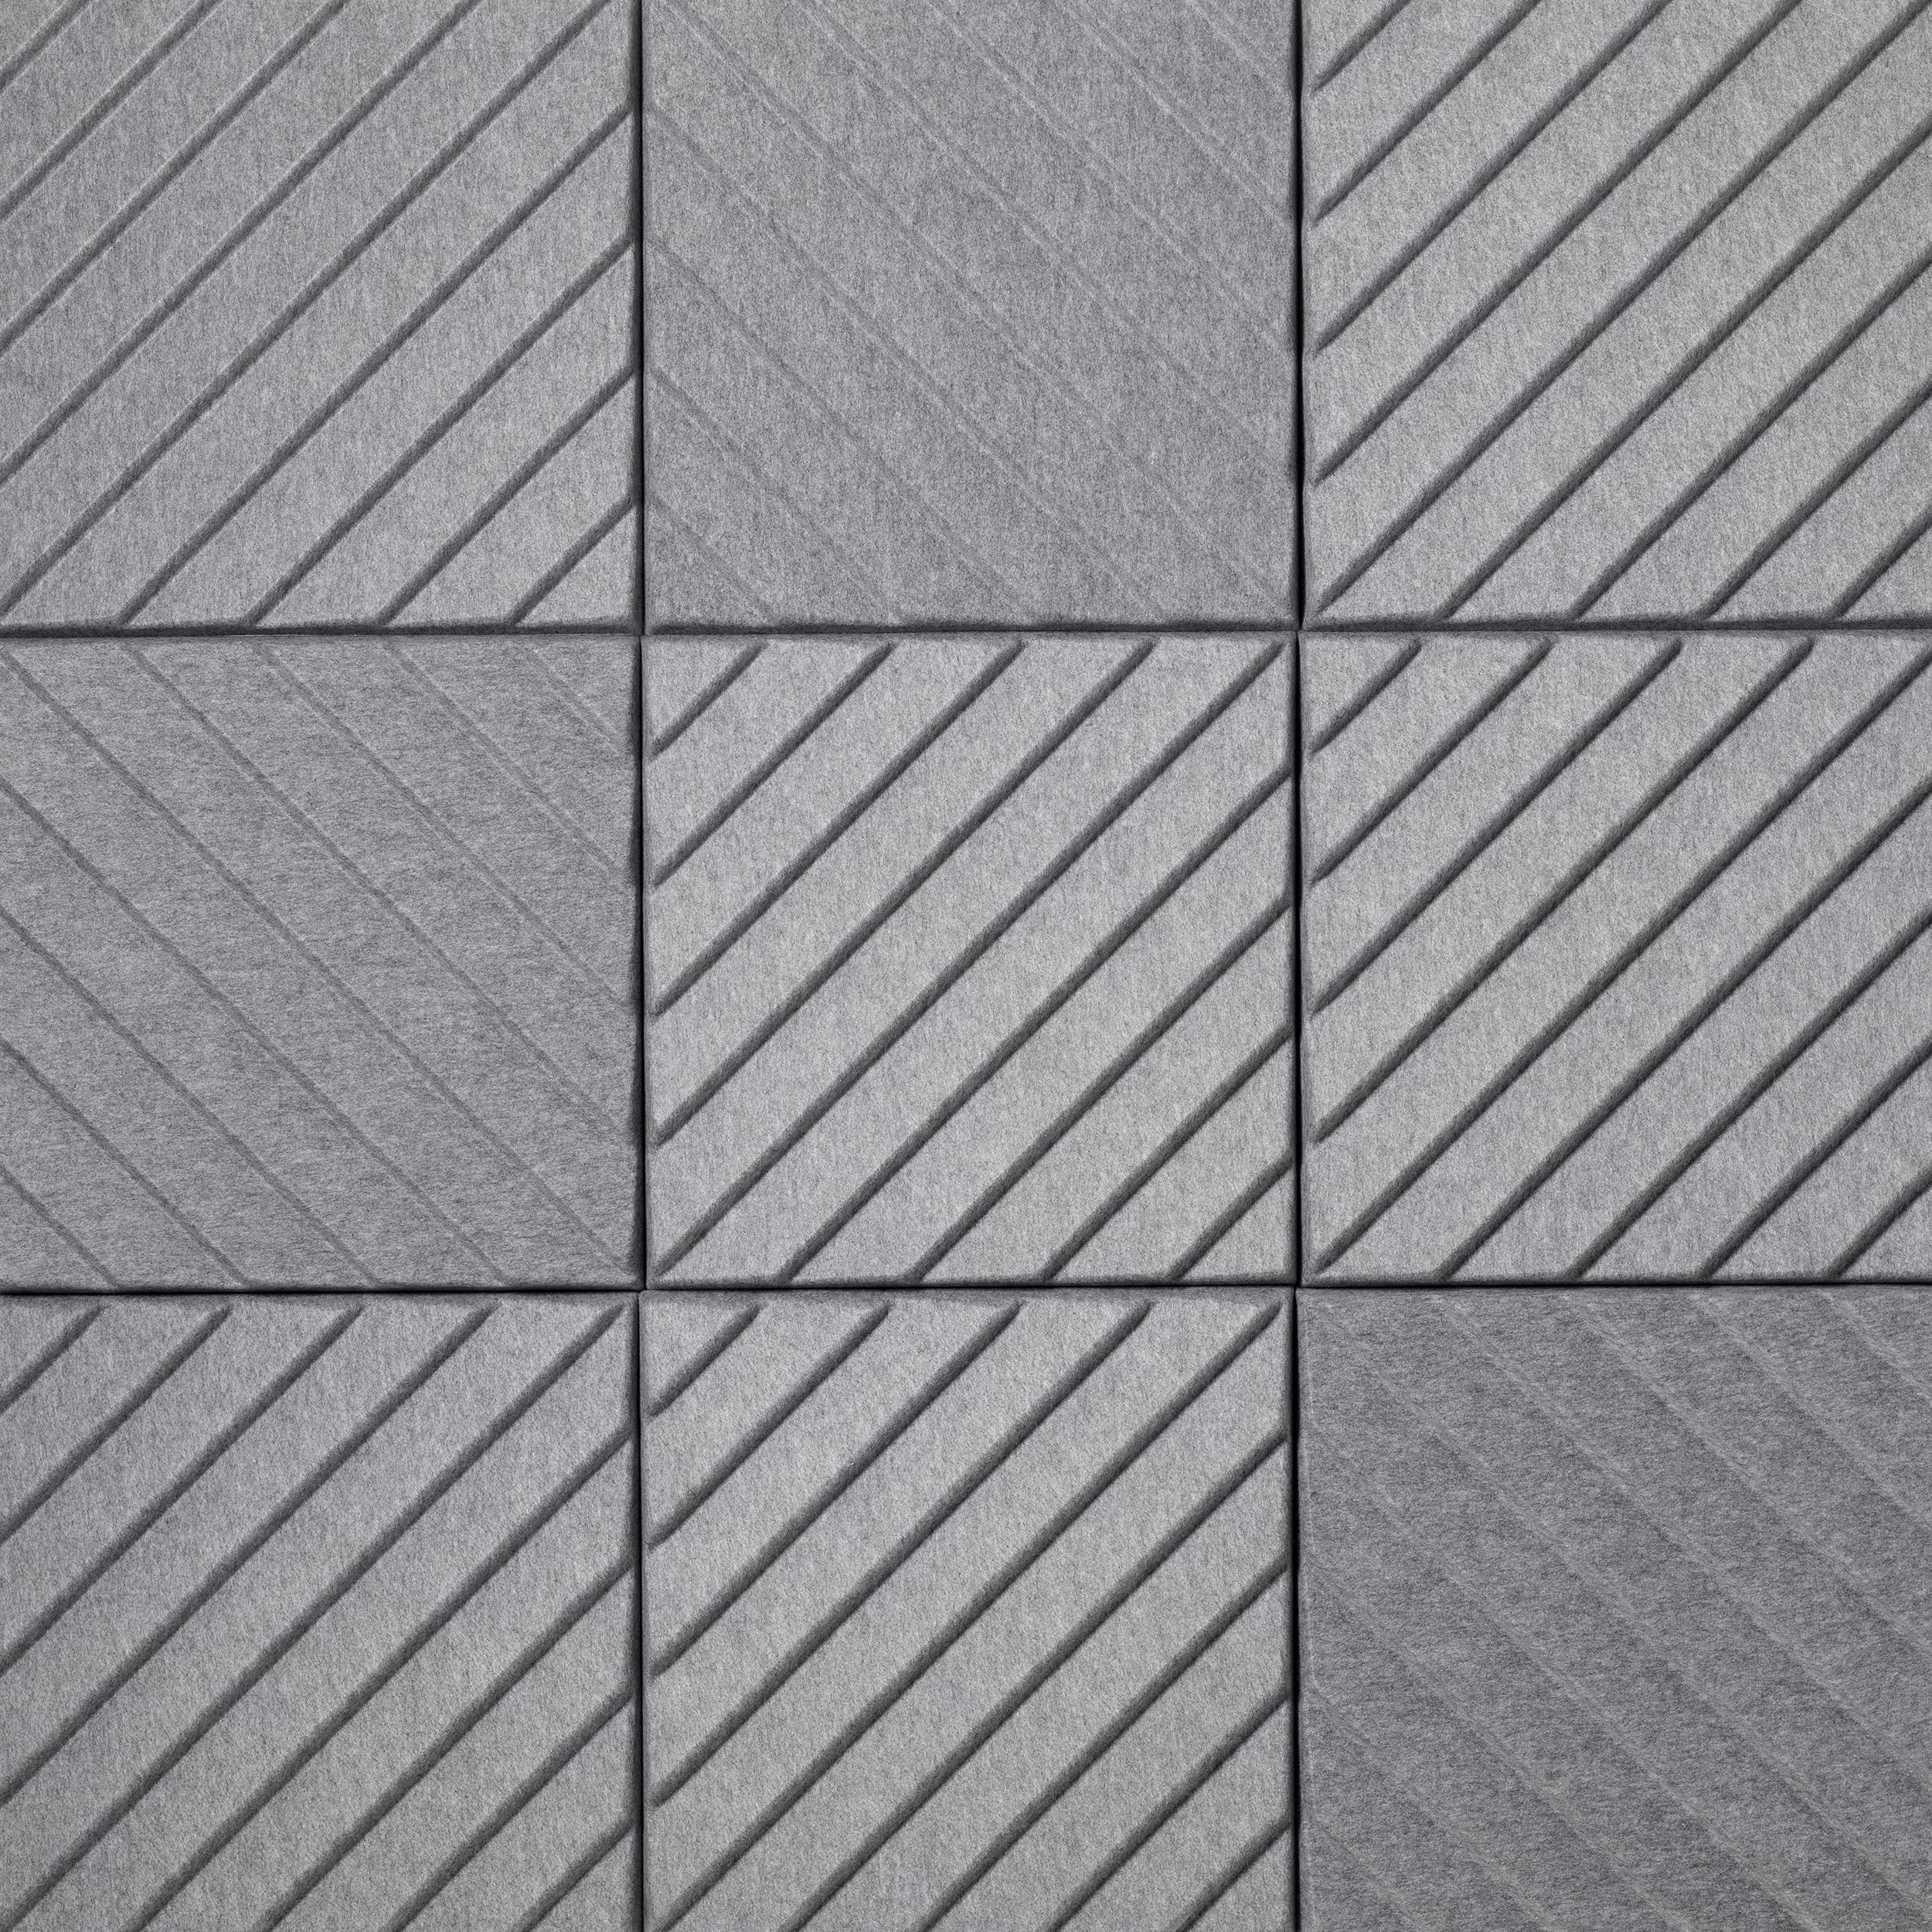 soundwave stripes acoustic wall panel richard hutten offecct